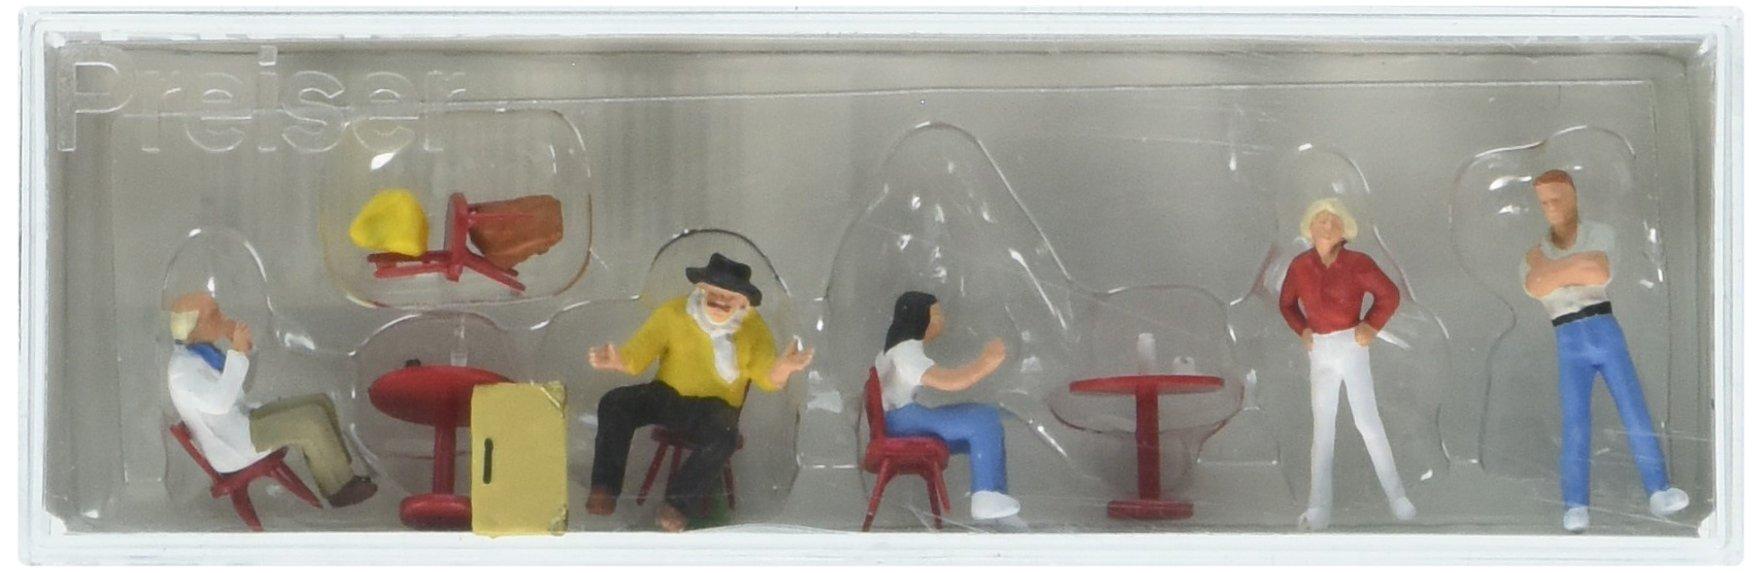 Preiser 10349 Recreation & Sports Students/Artists in Cafe HO Model Figure